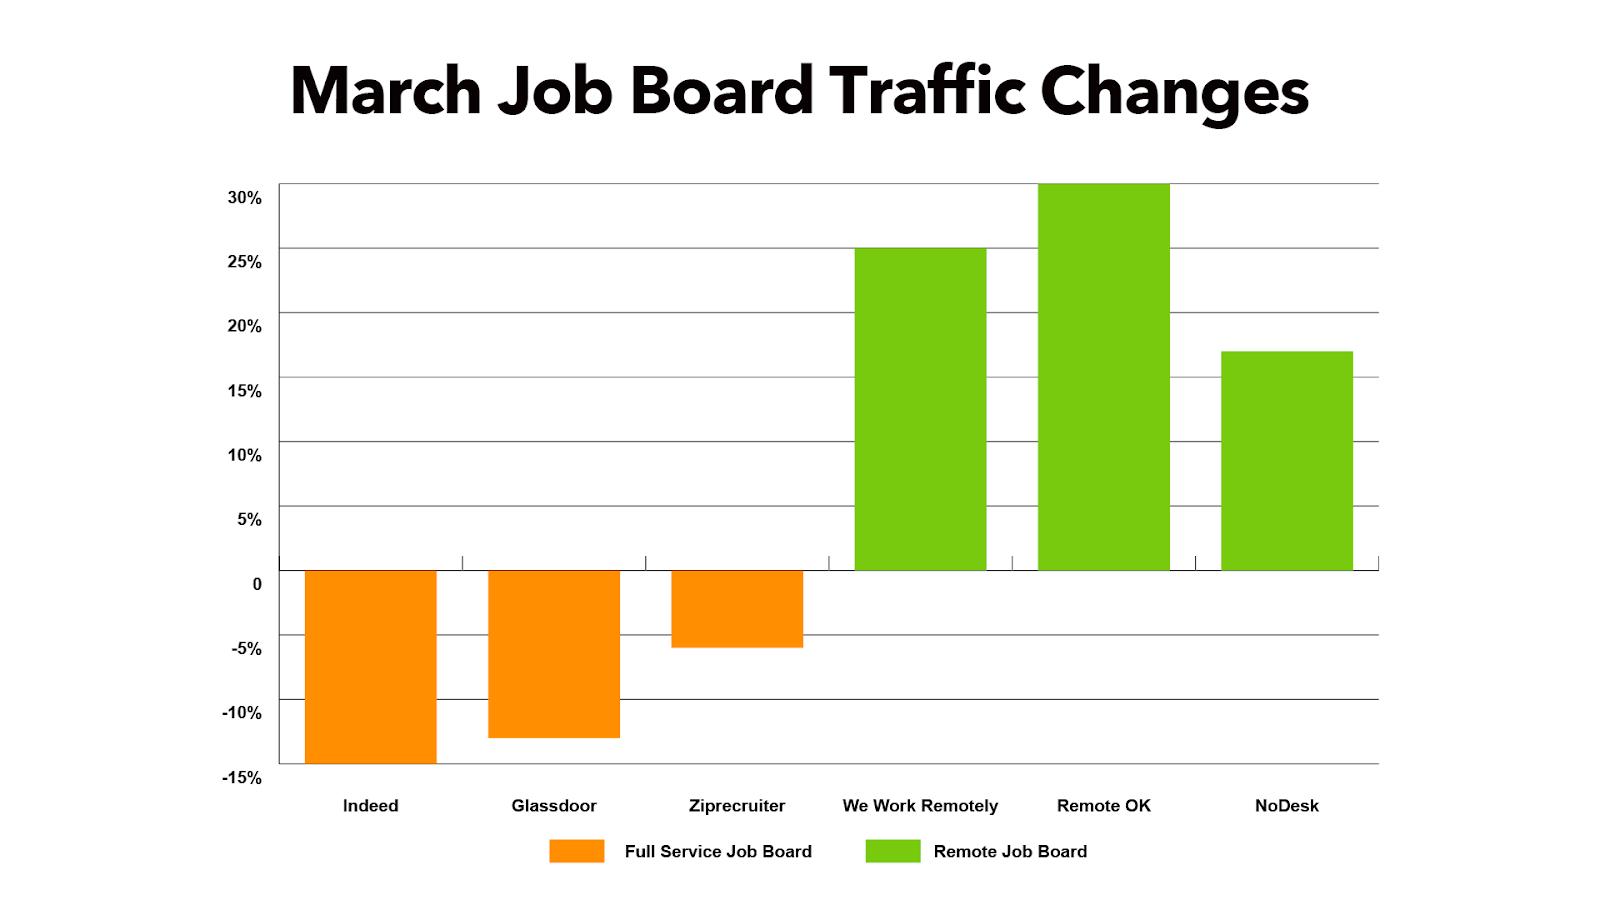 March Job Board Traffic Changes